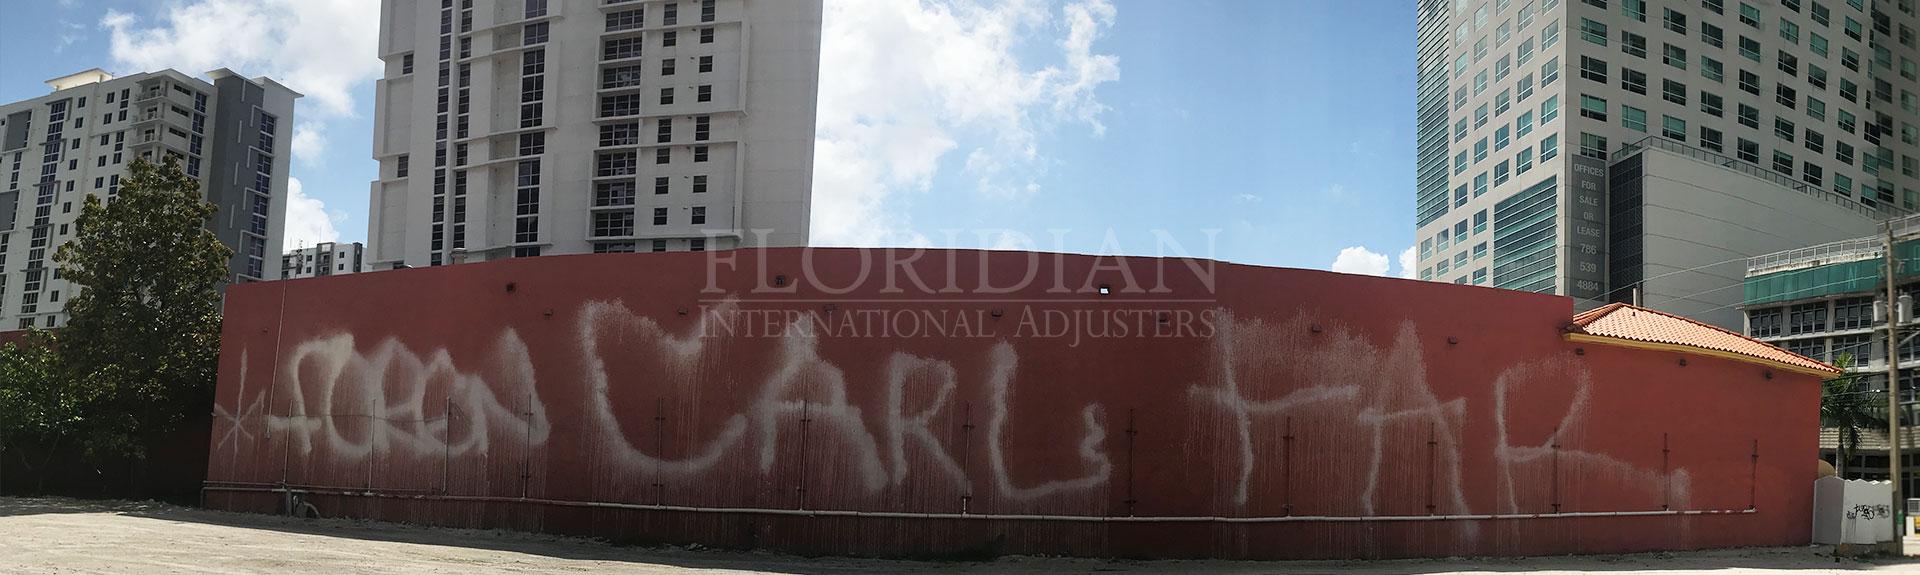 Vandalism claims